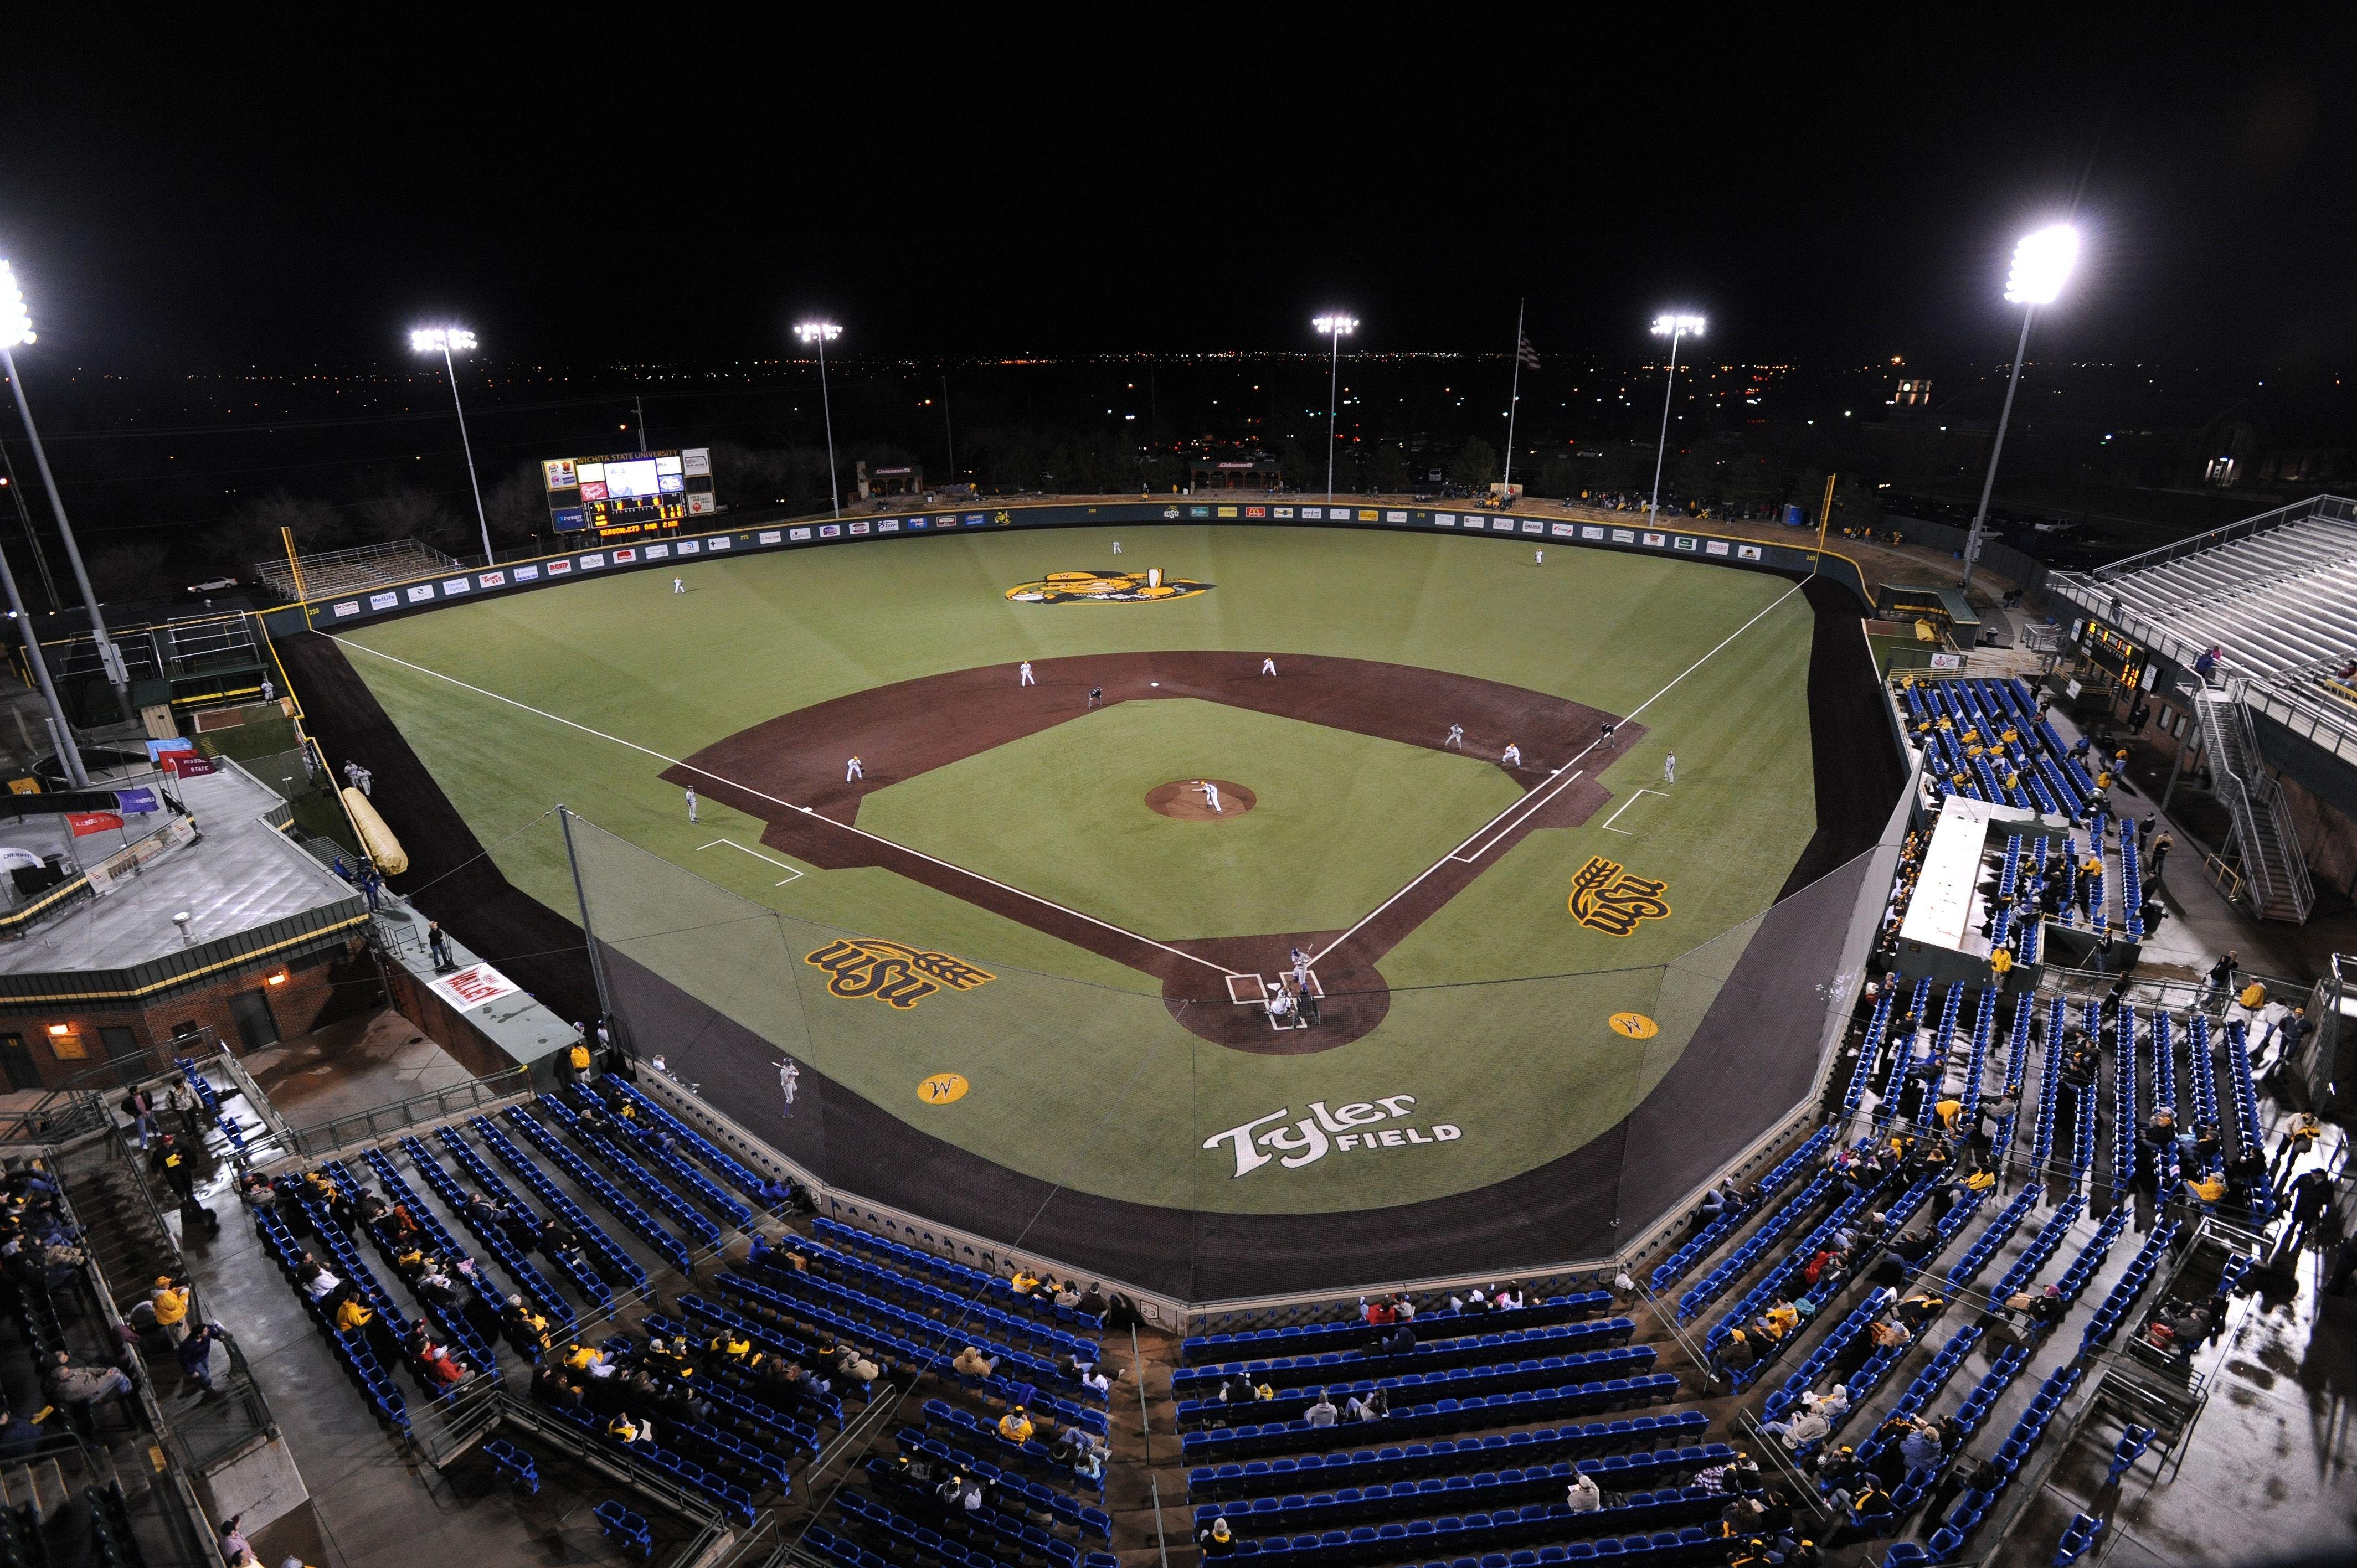 Wichita State University Eck Stadium 166 800 Square Feet Of Astroturf Gameday Grass 3d Installed In 2009